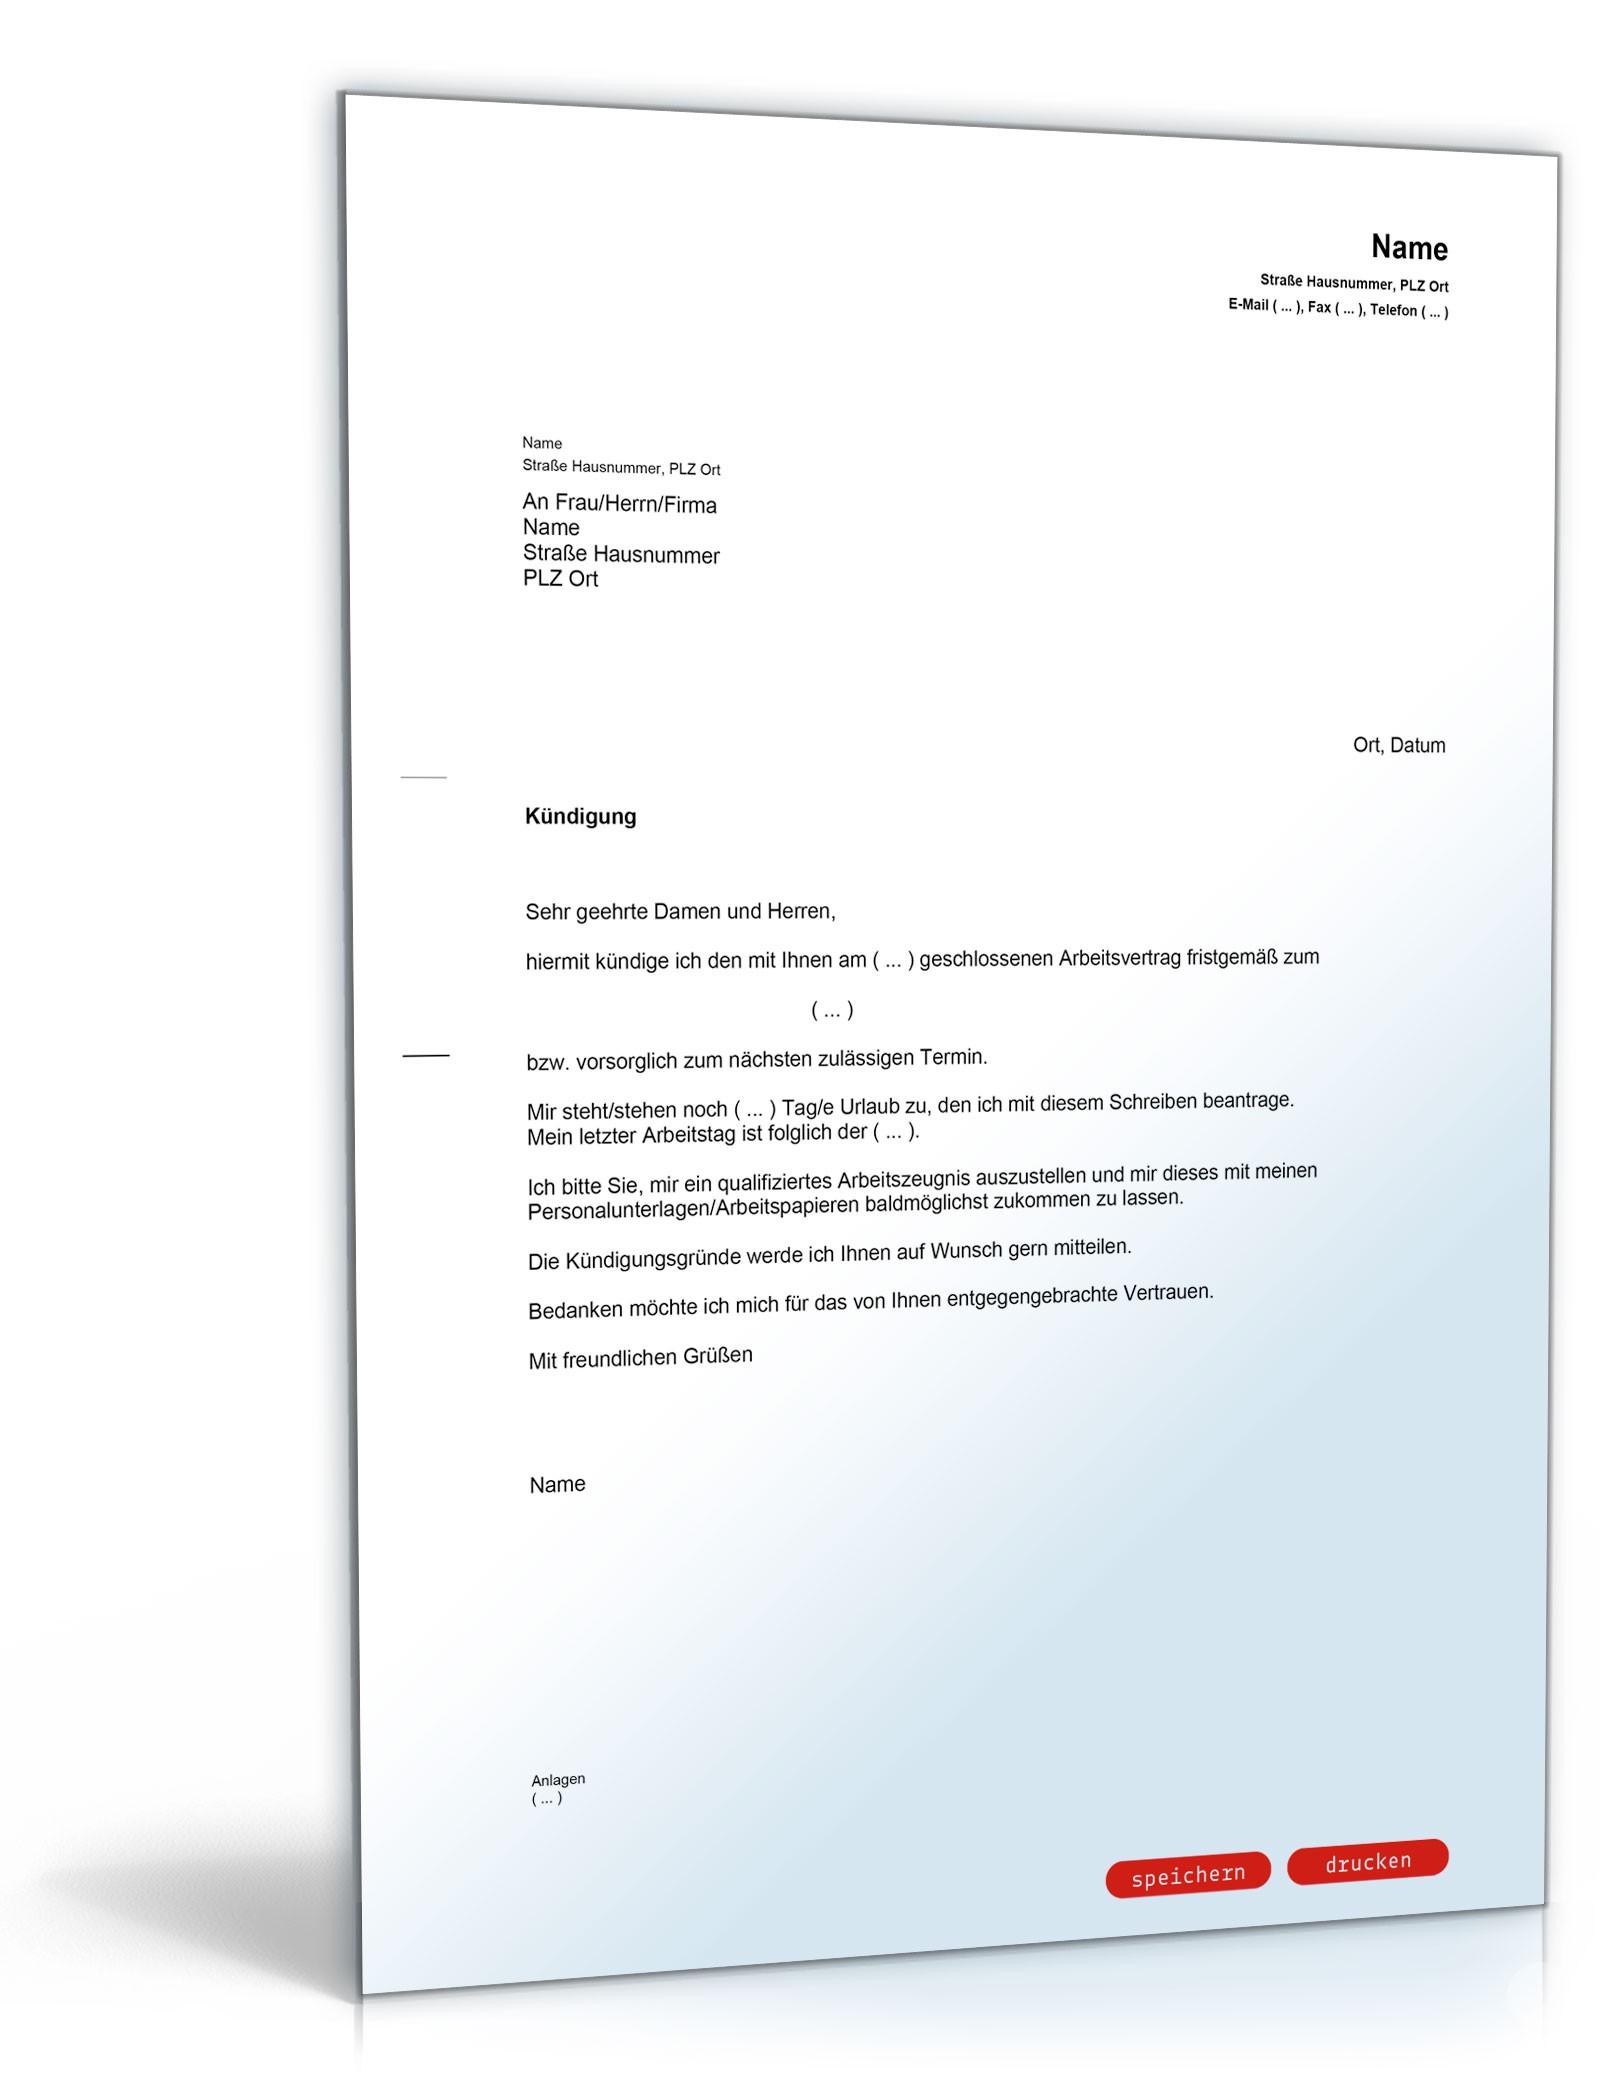 kndigung dienstvertrag - Kundigung Arbeitsvertrag Muster